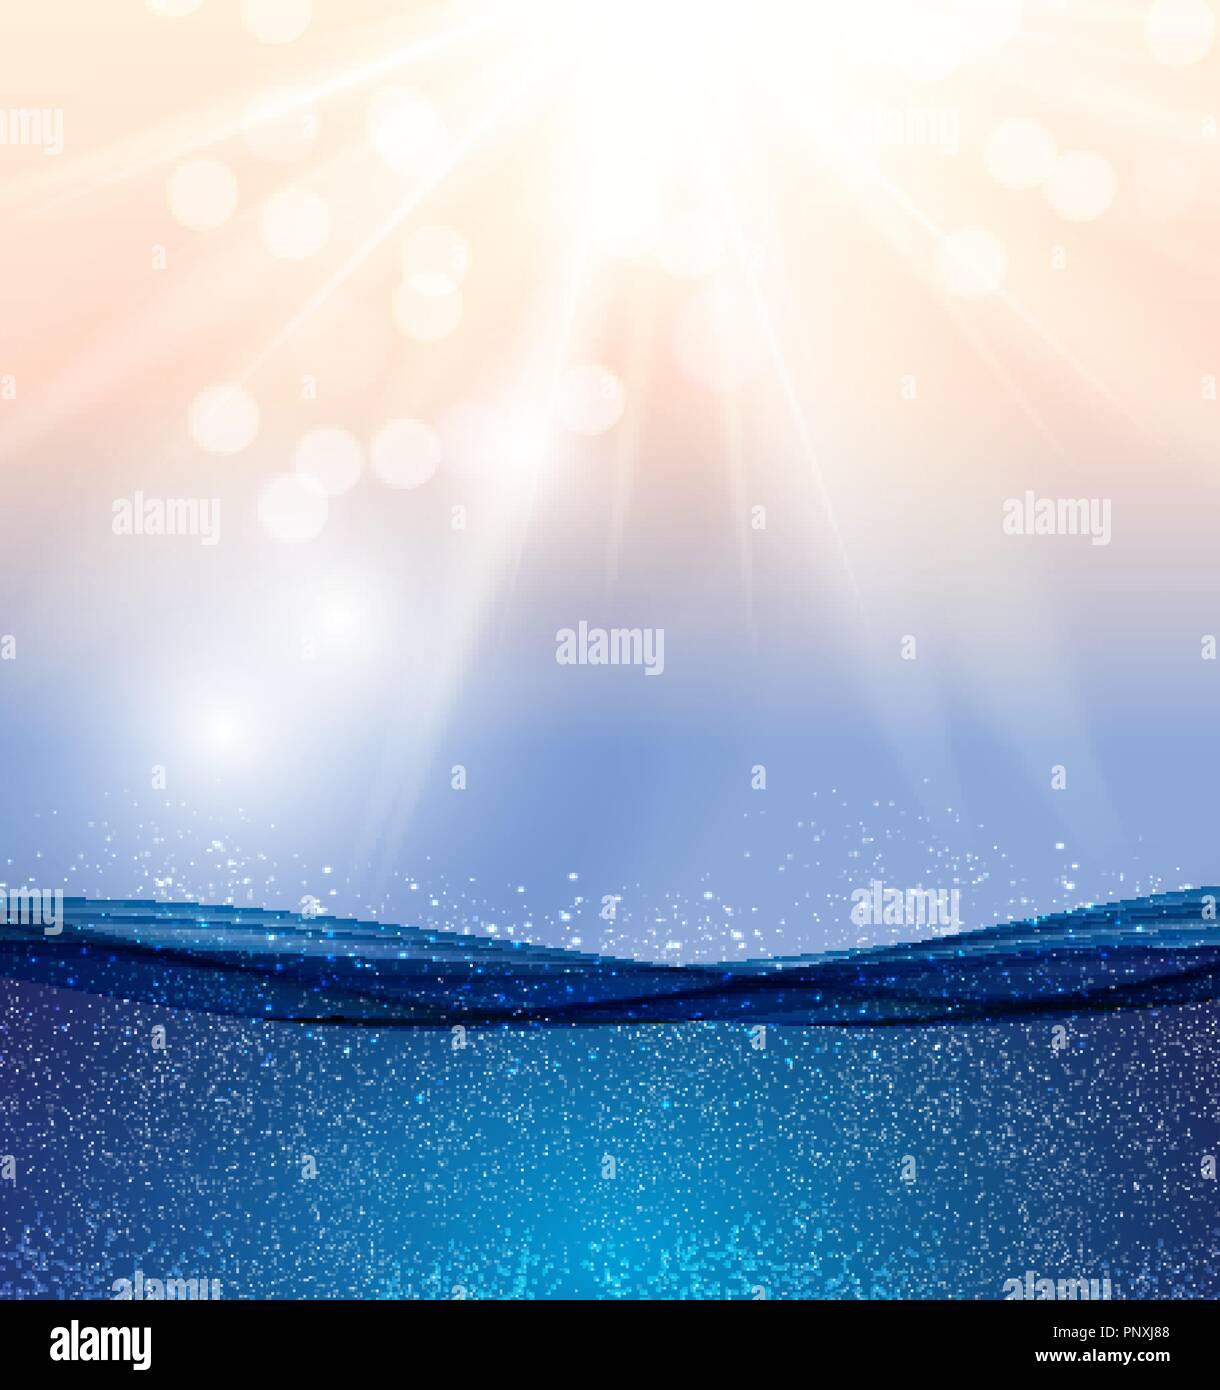 Abstract Blue Underwater Ocean Wave Background Vector